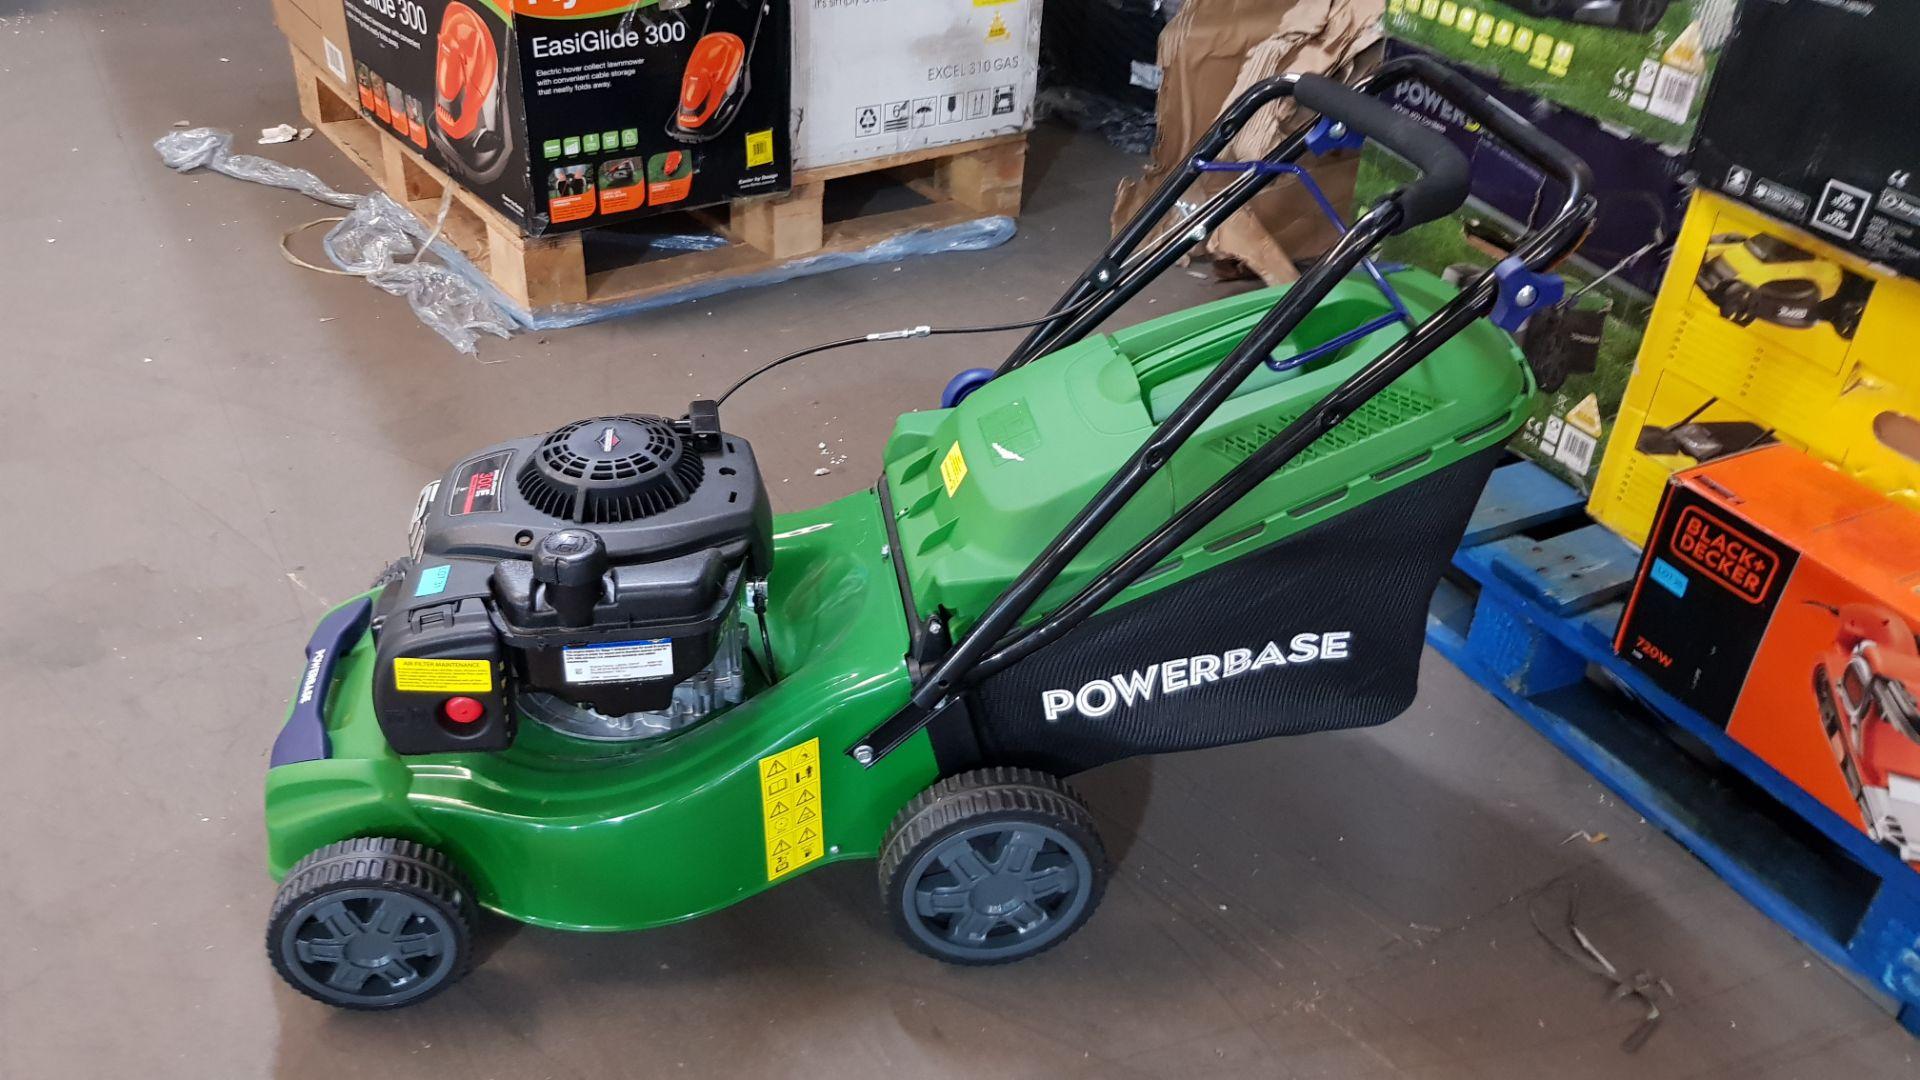 (P10) 1x Powerbase 41cm 125cc Push Petrol Rotary Lawn Mower (XSS41D) RRP £199. New, Clean Unused I - Image 4 of 8